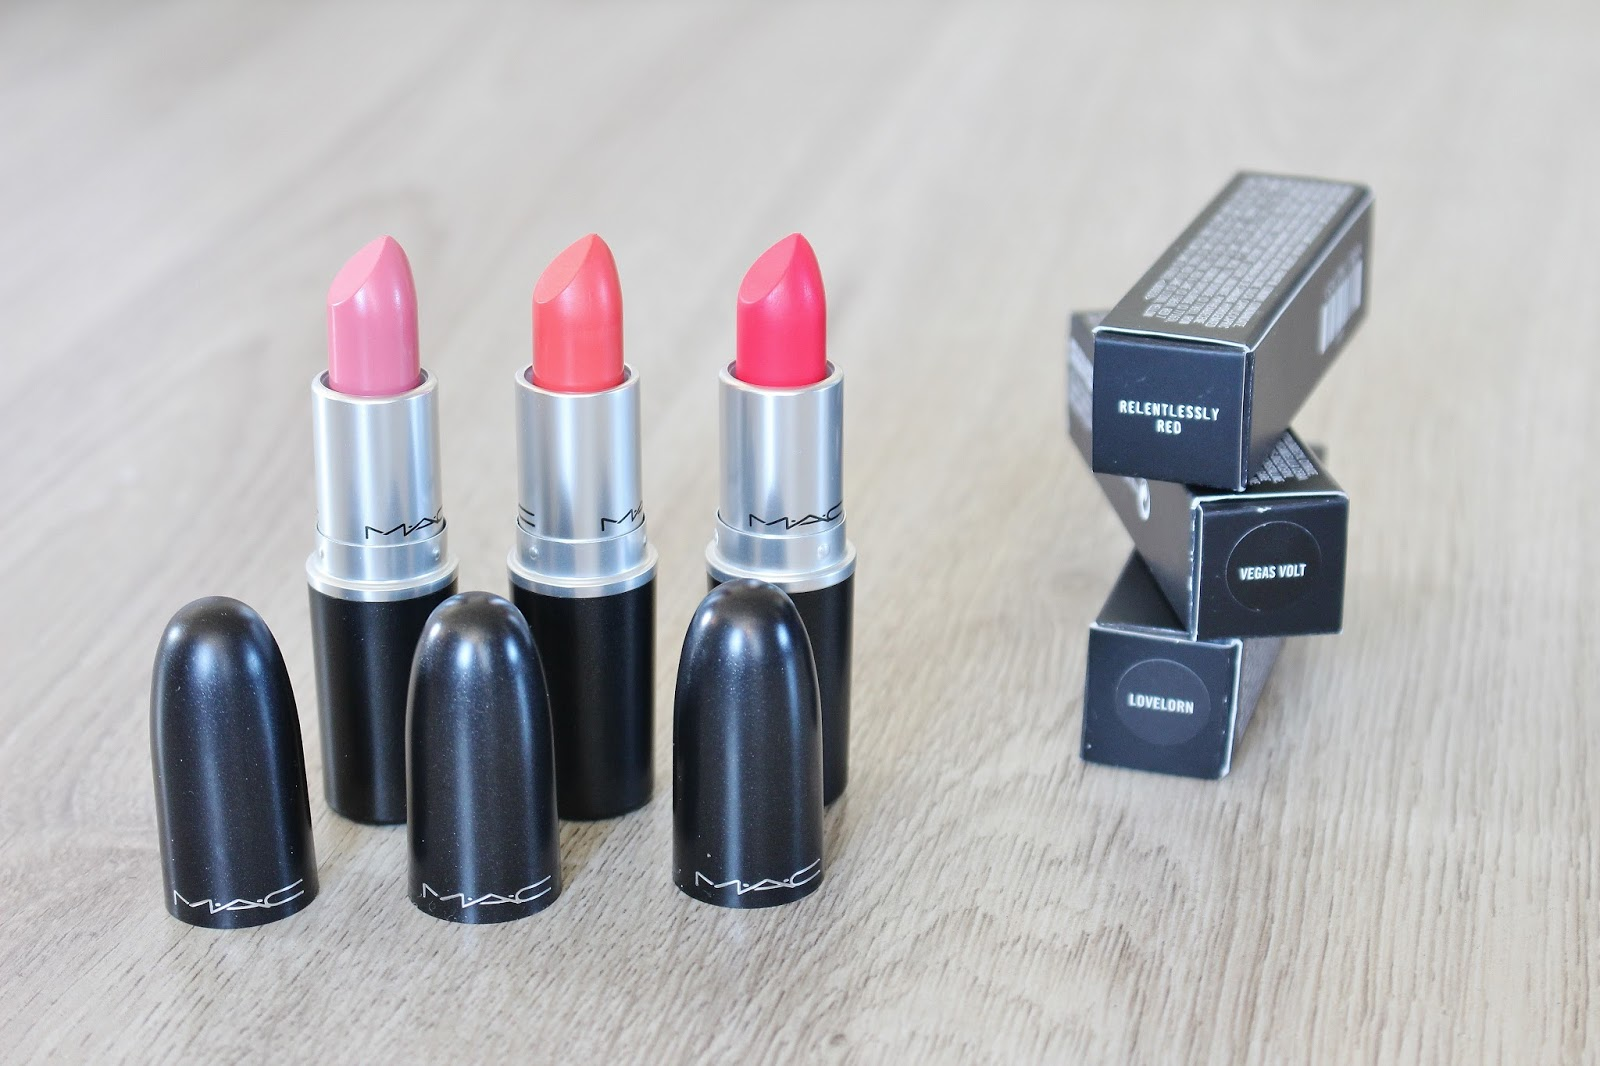 3 x MAC Lipsticks – Relentlessly Red, Vegas Volt & Lovelorn